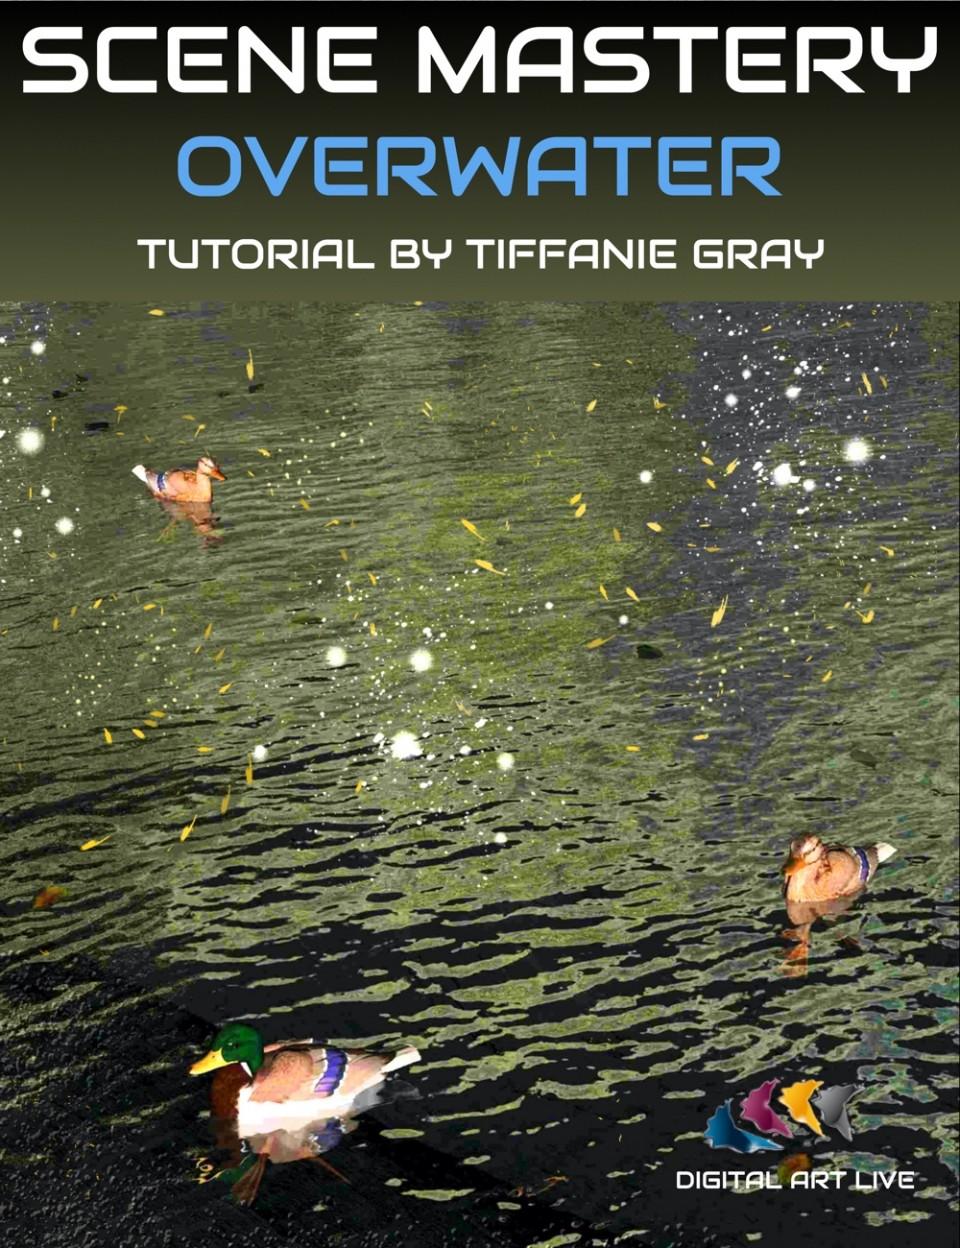 Scene Mastery Tutorial: Overwater_DAZ3D下载站